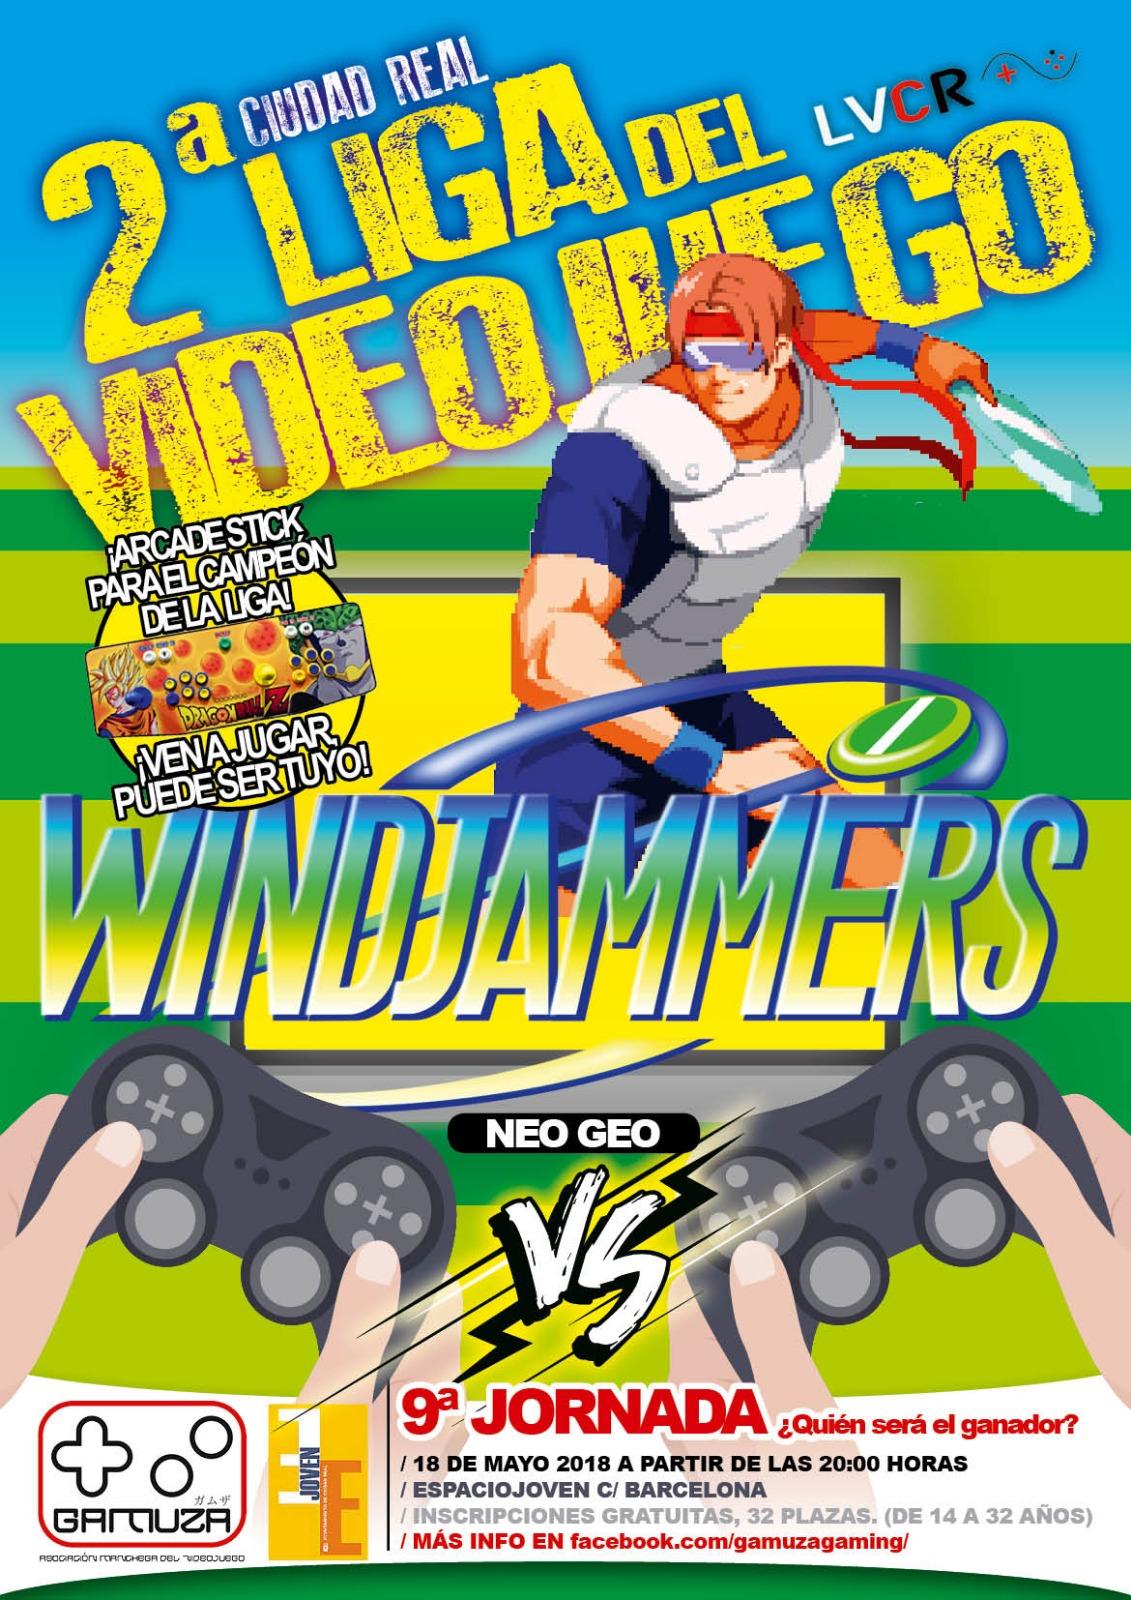 2ª Liga de Videojuegos Ciudad Real. Jornada 9 - Gamuza: Gaming Yakuza